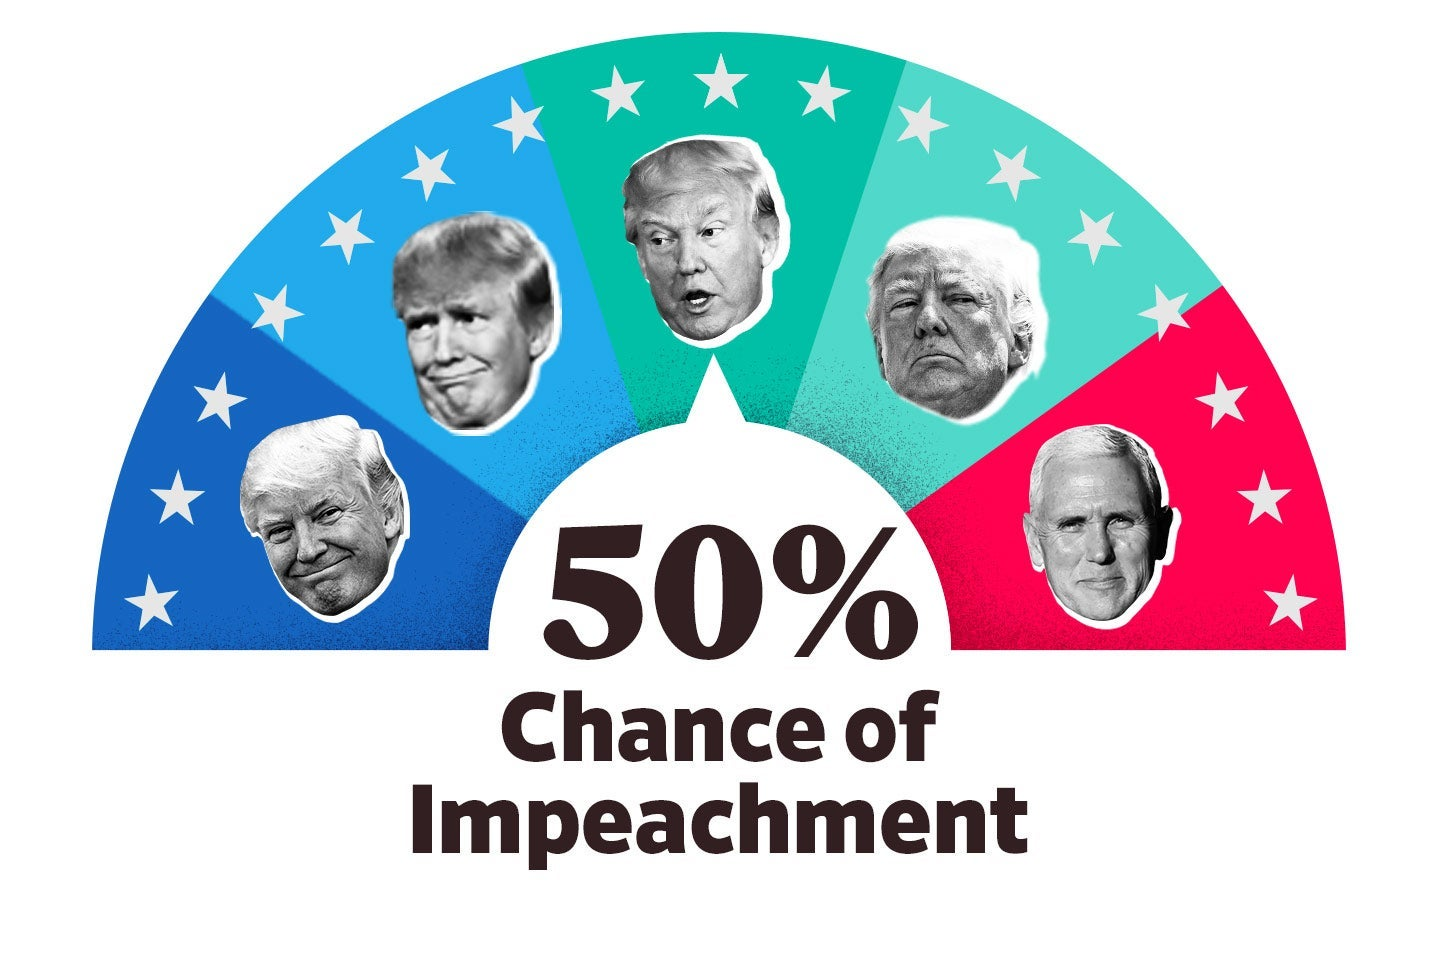 Impeach-O-Meter: 50 percent